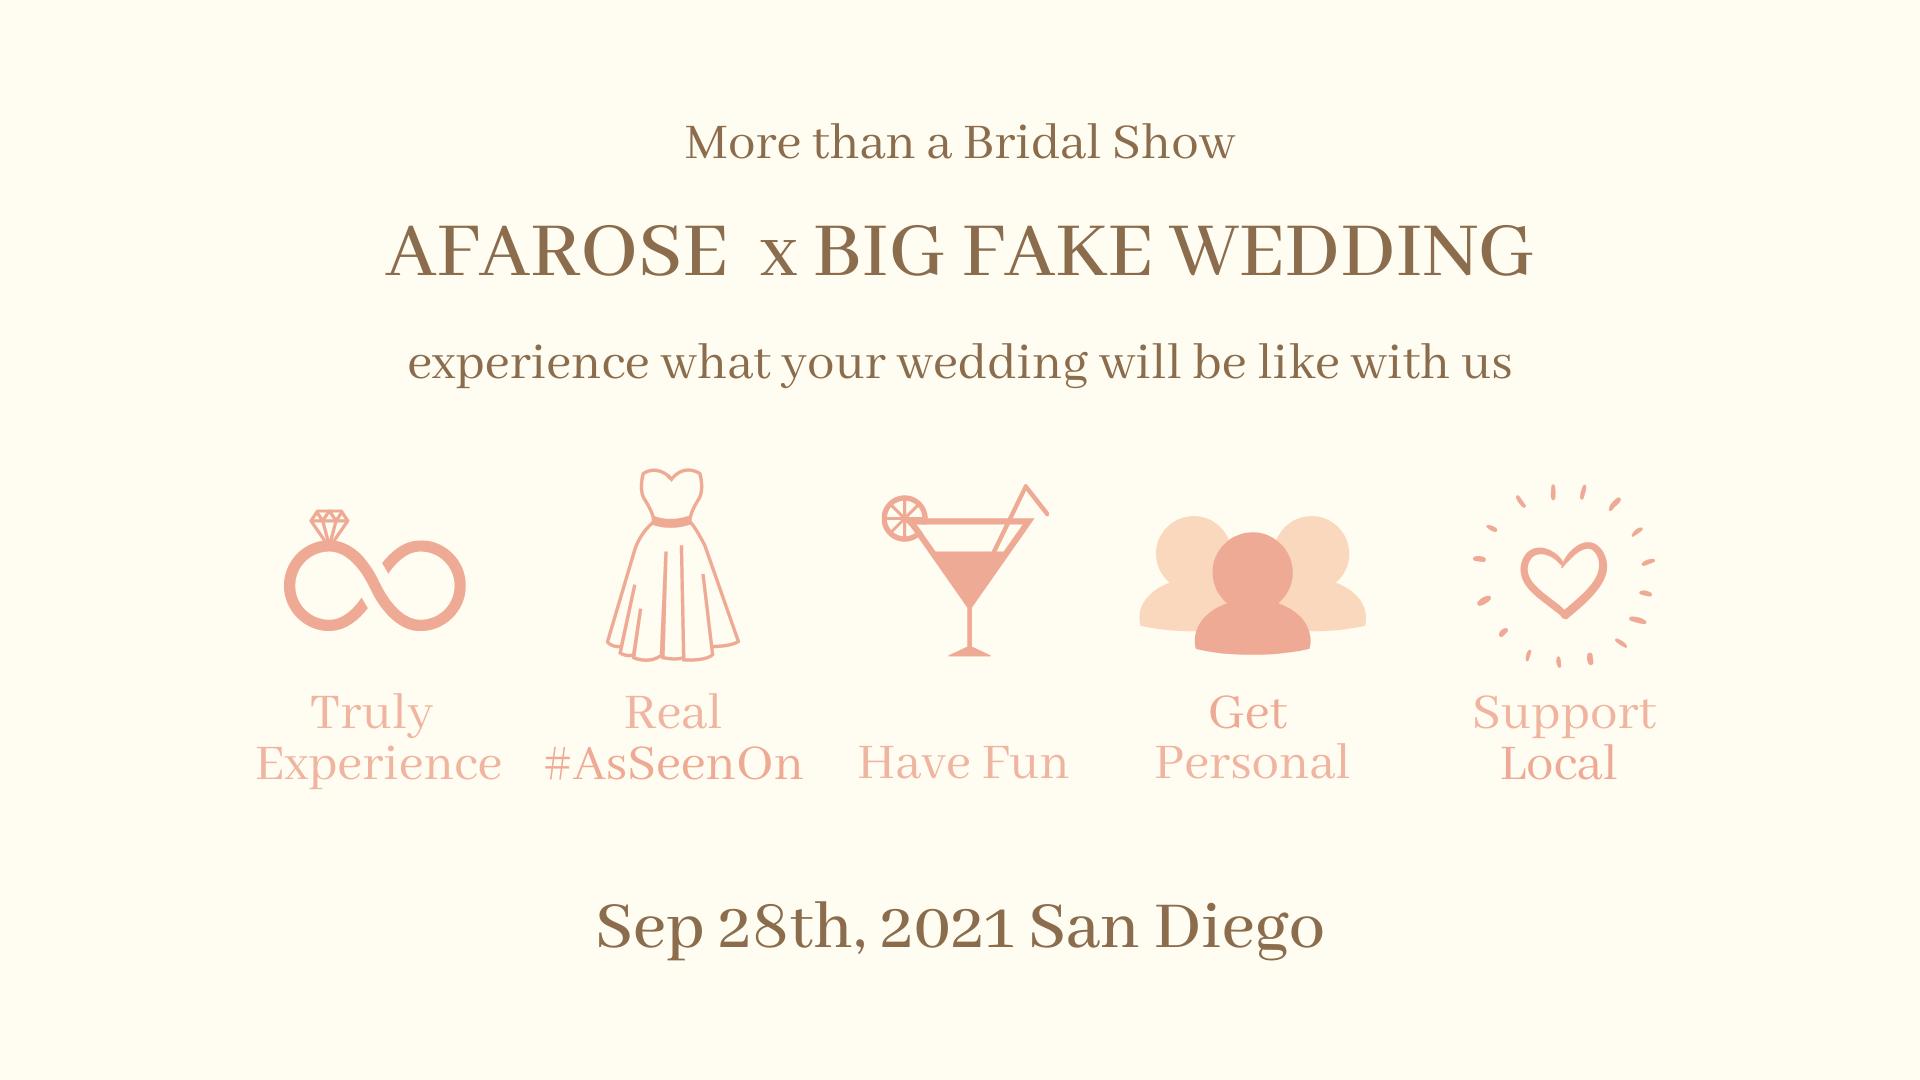 The Big Fake Wedding San Diego Event